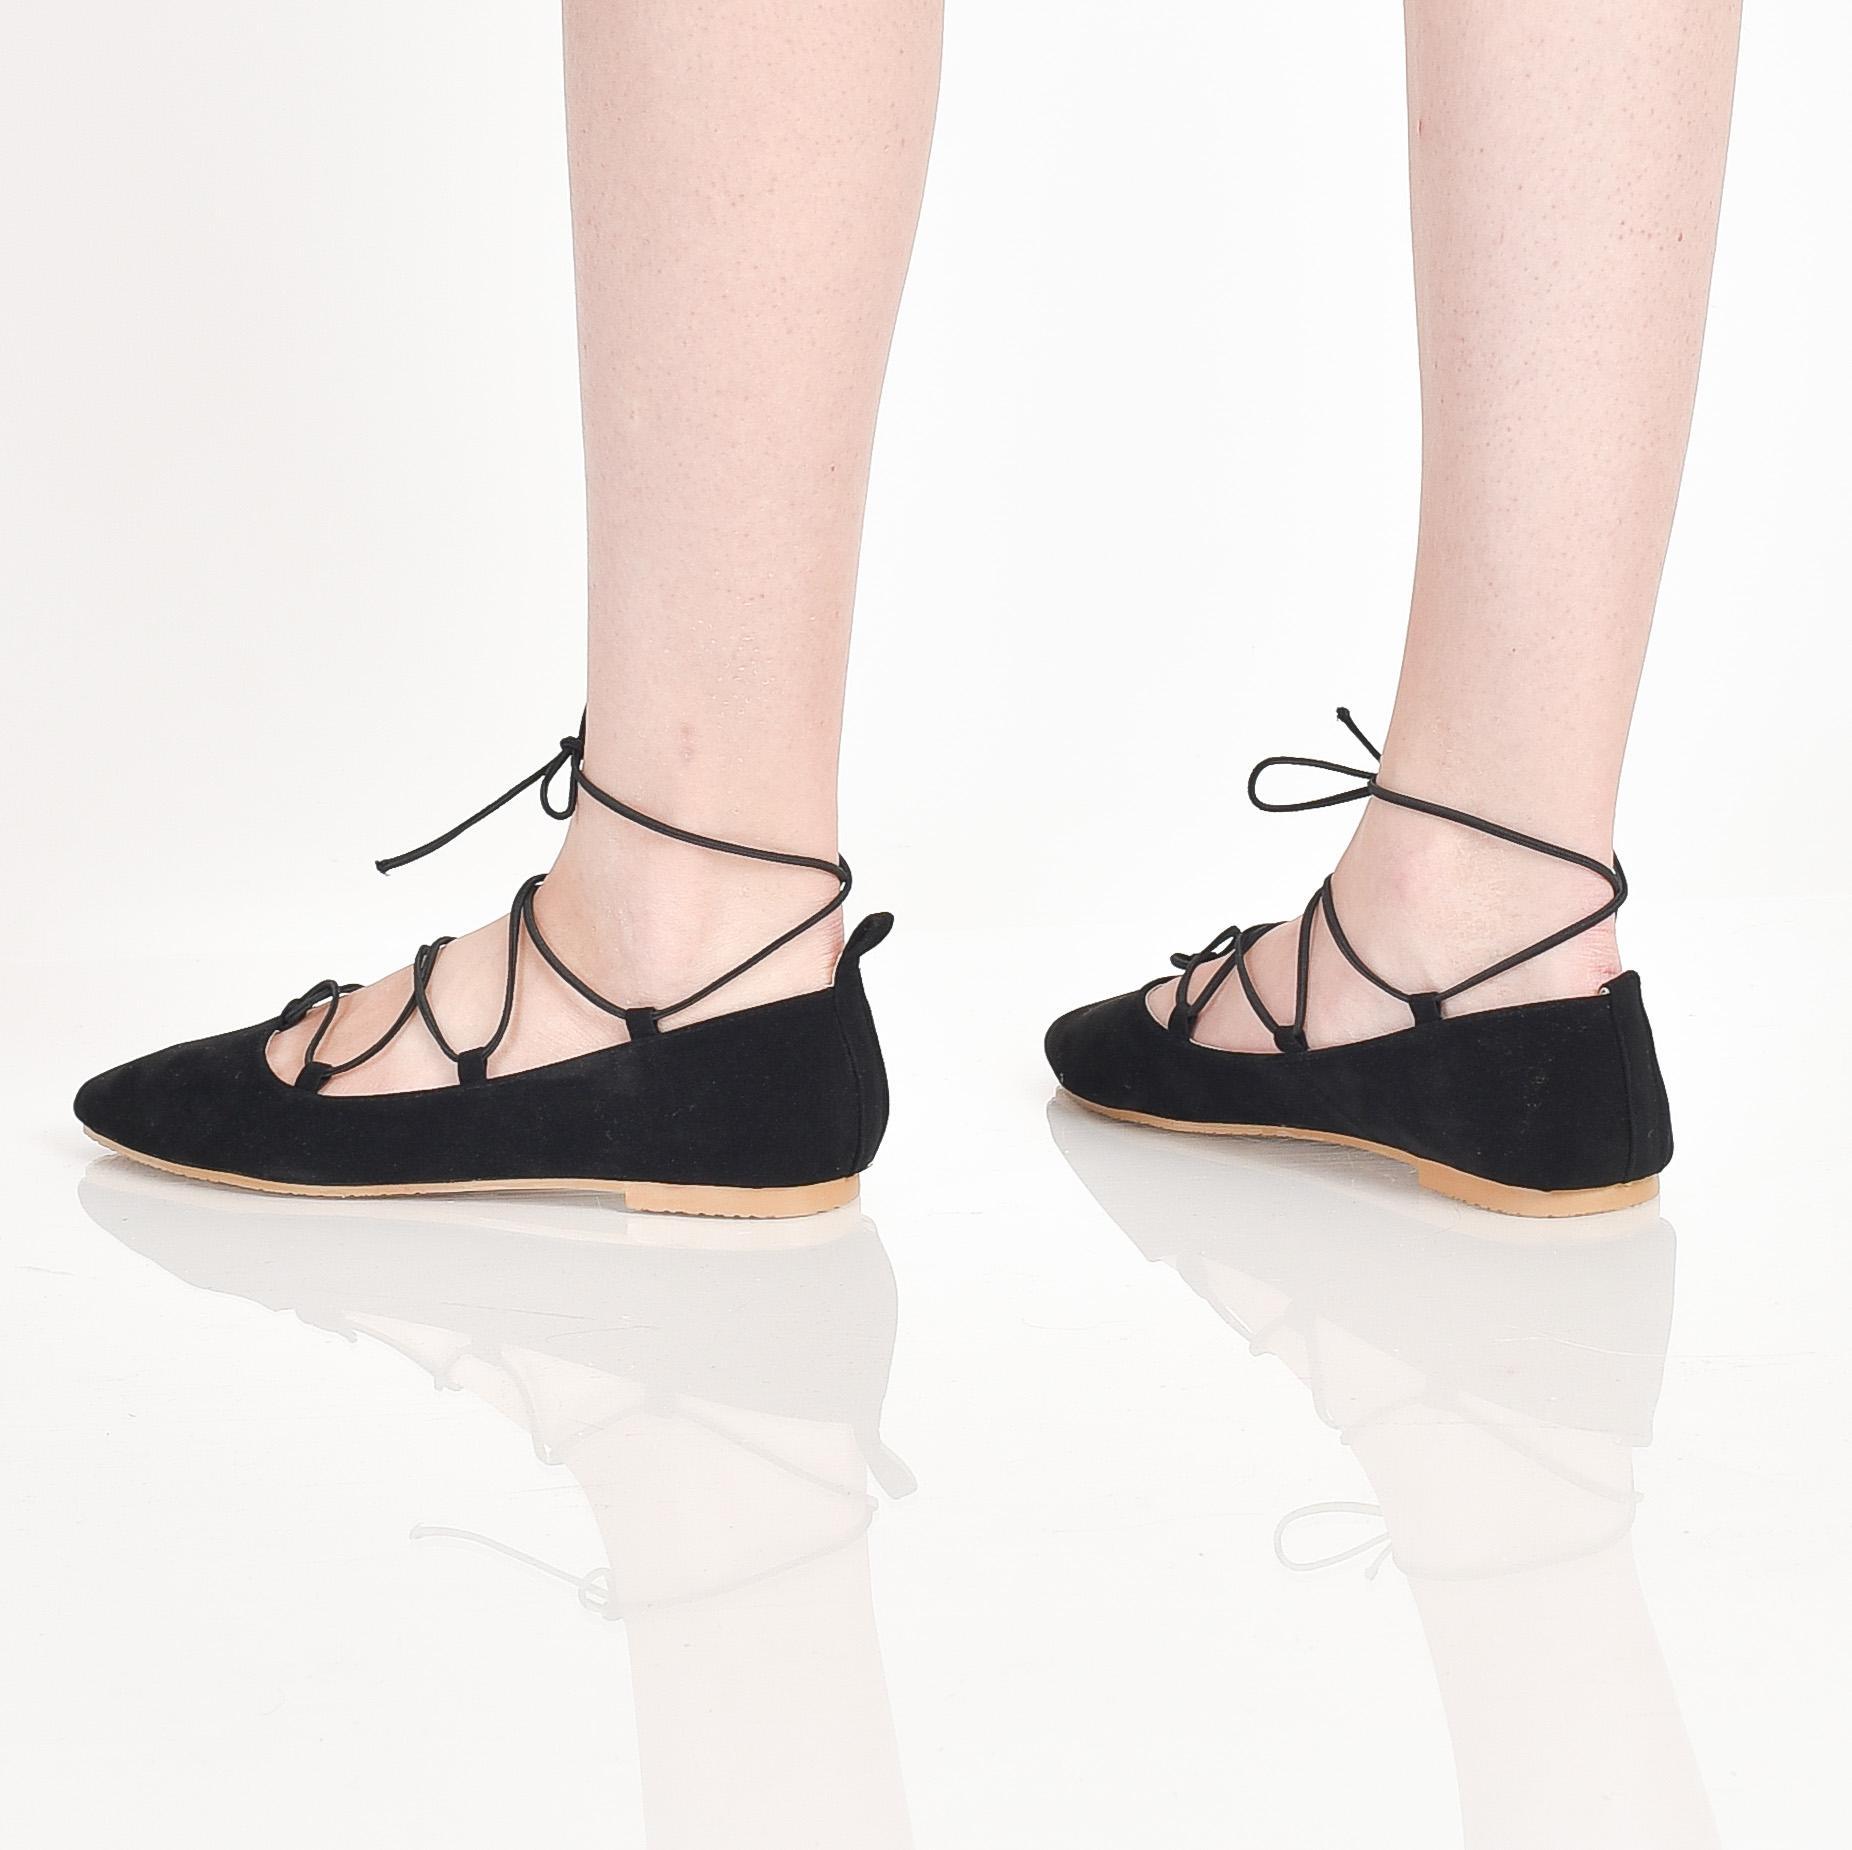 Bebbishoes-Ballerina Flatshoes-Black - 3 .